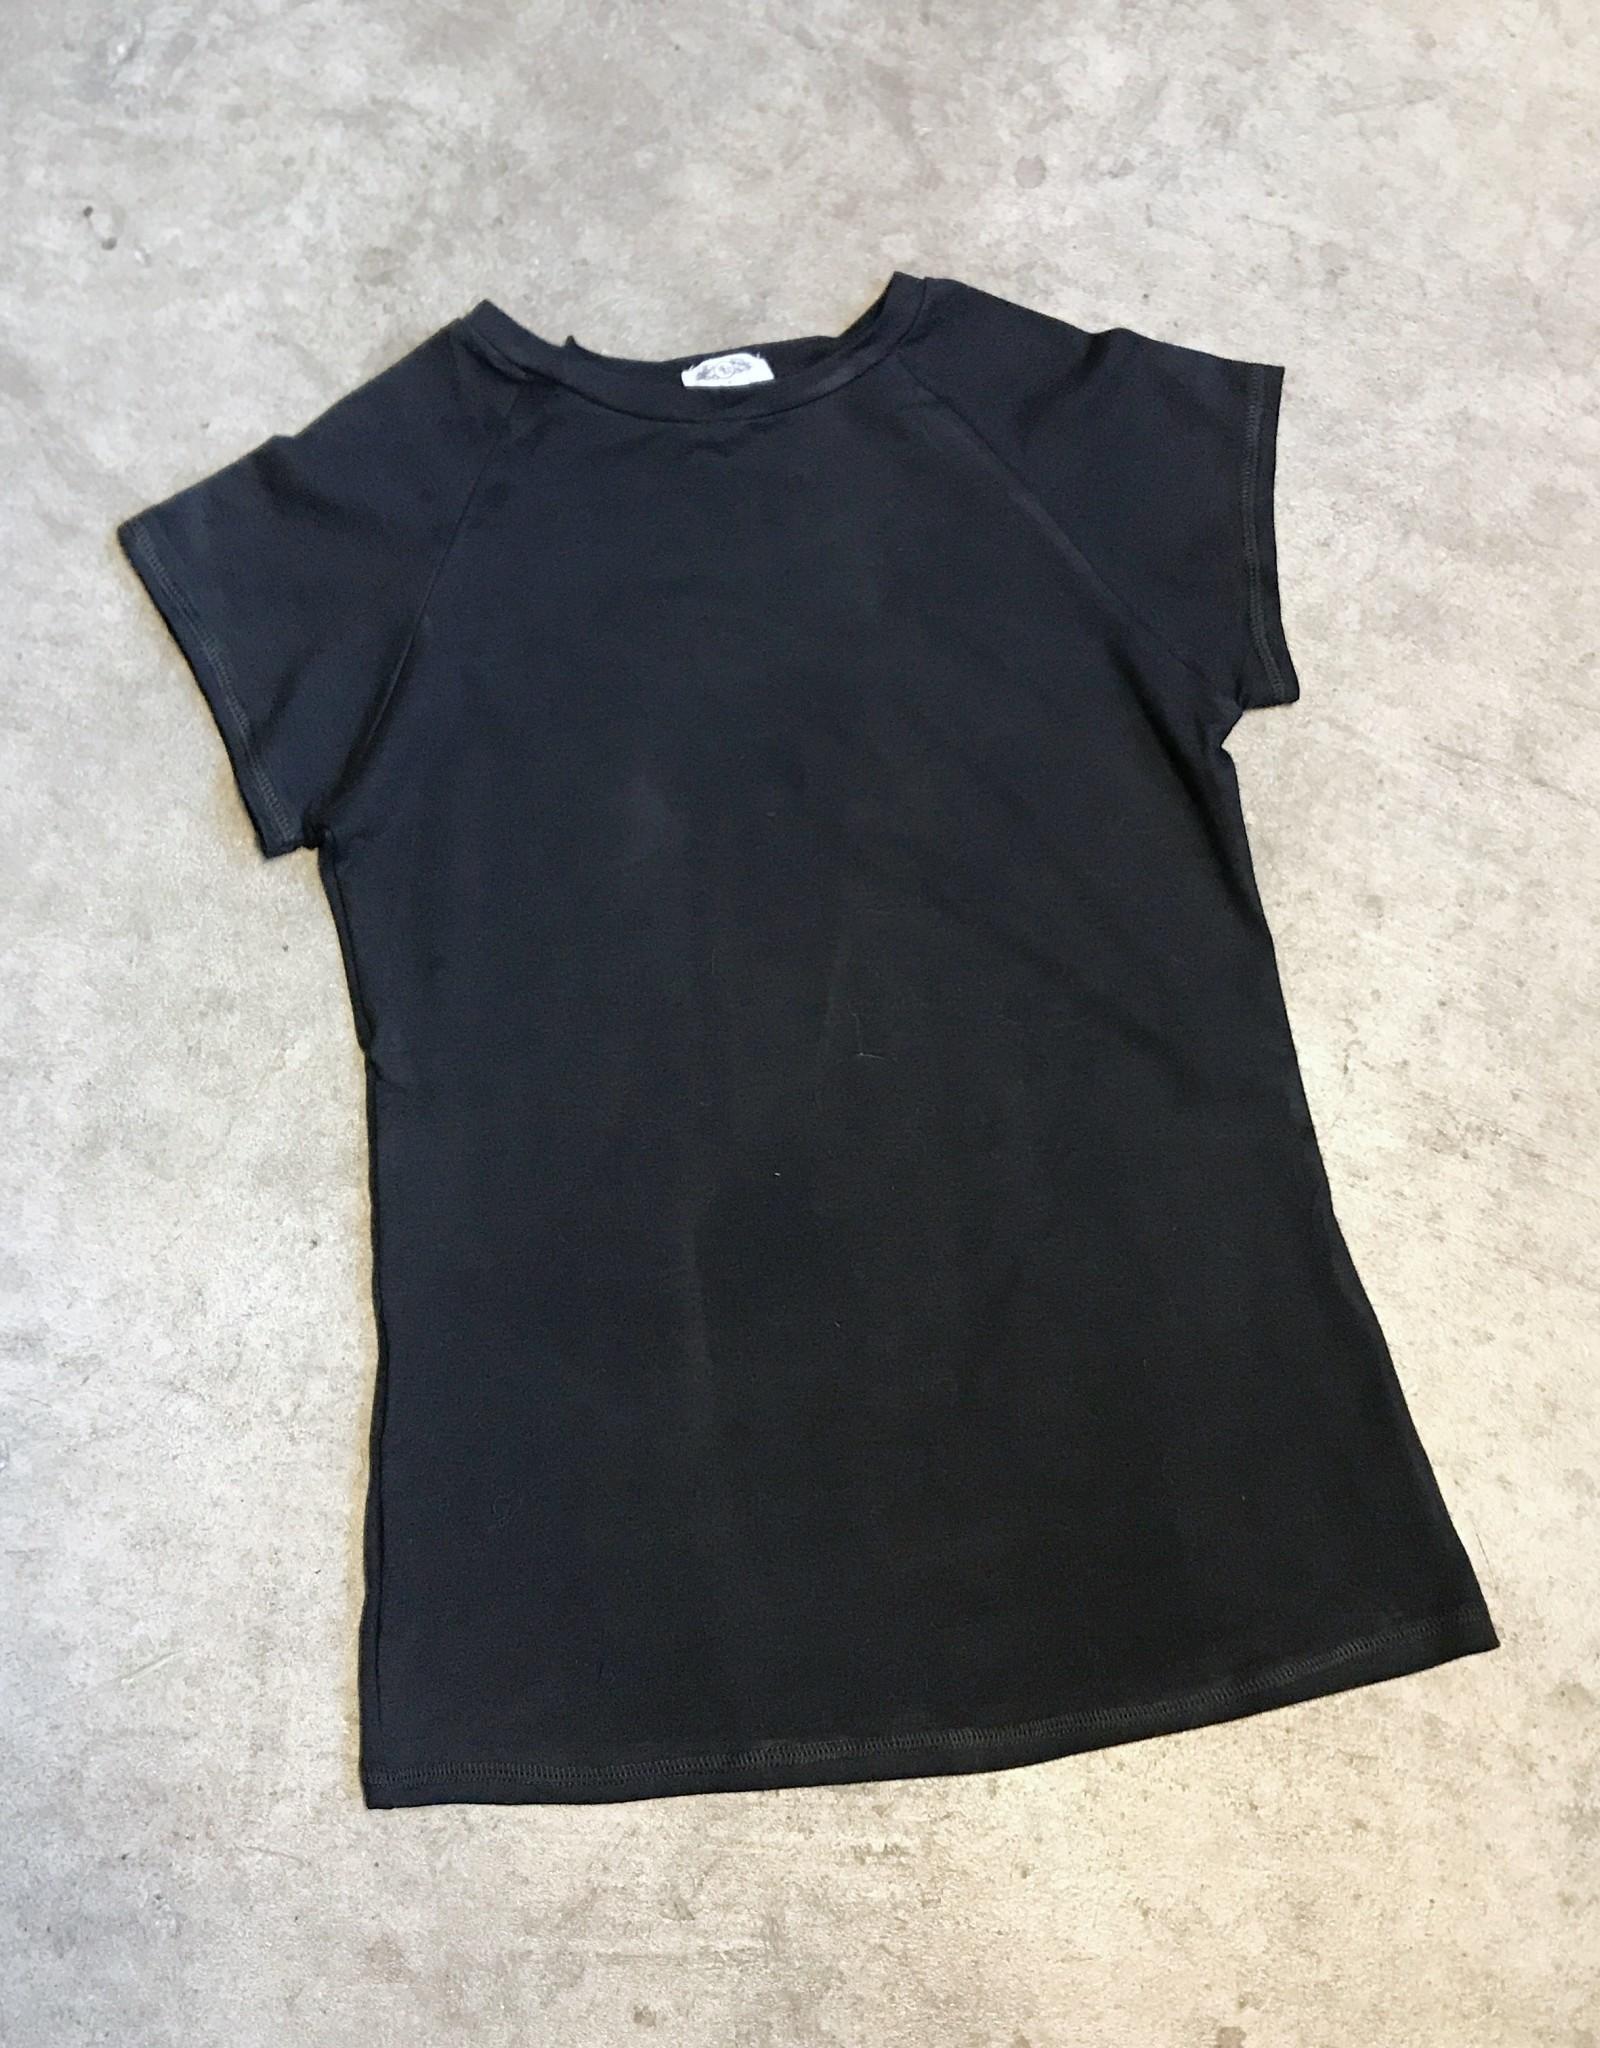 Devil May Wear Ideal Crewneck Raglan, Bamboo from Rayon/Cotton/Spandex, Black